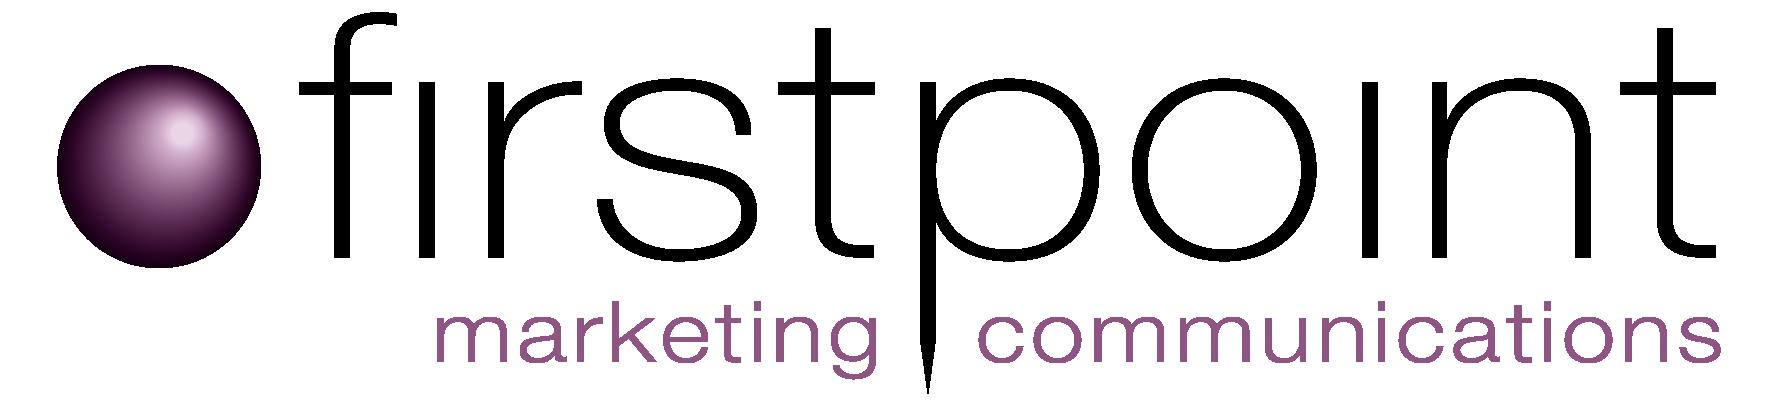 Avatar - Firstpoint Marketing & Communications